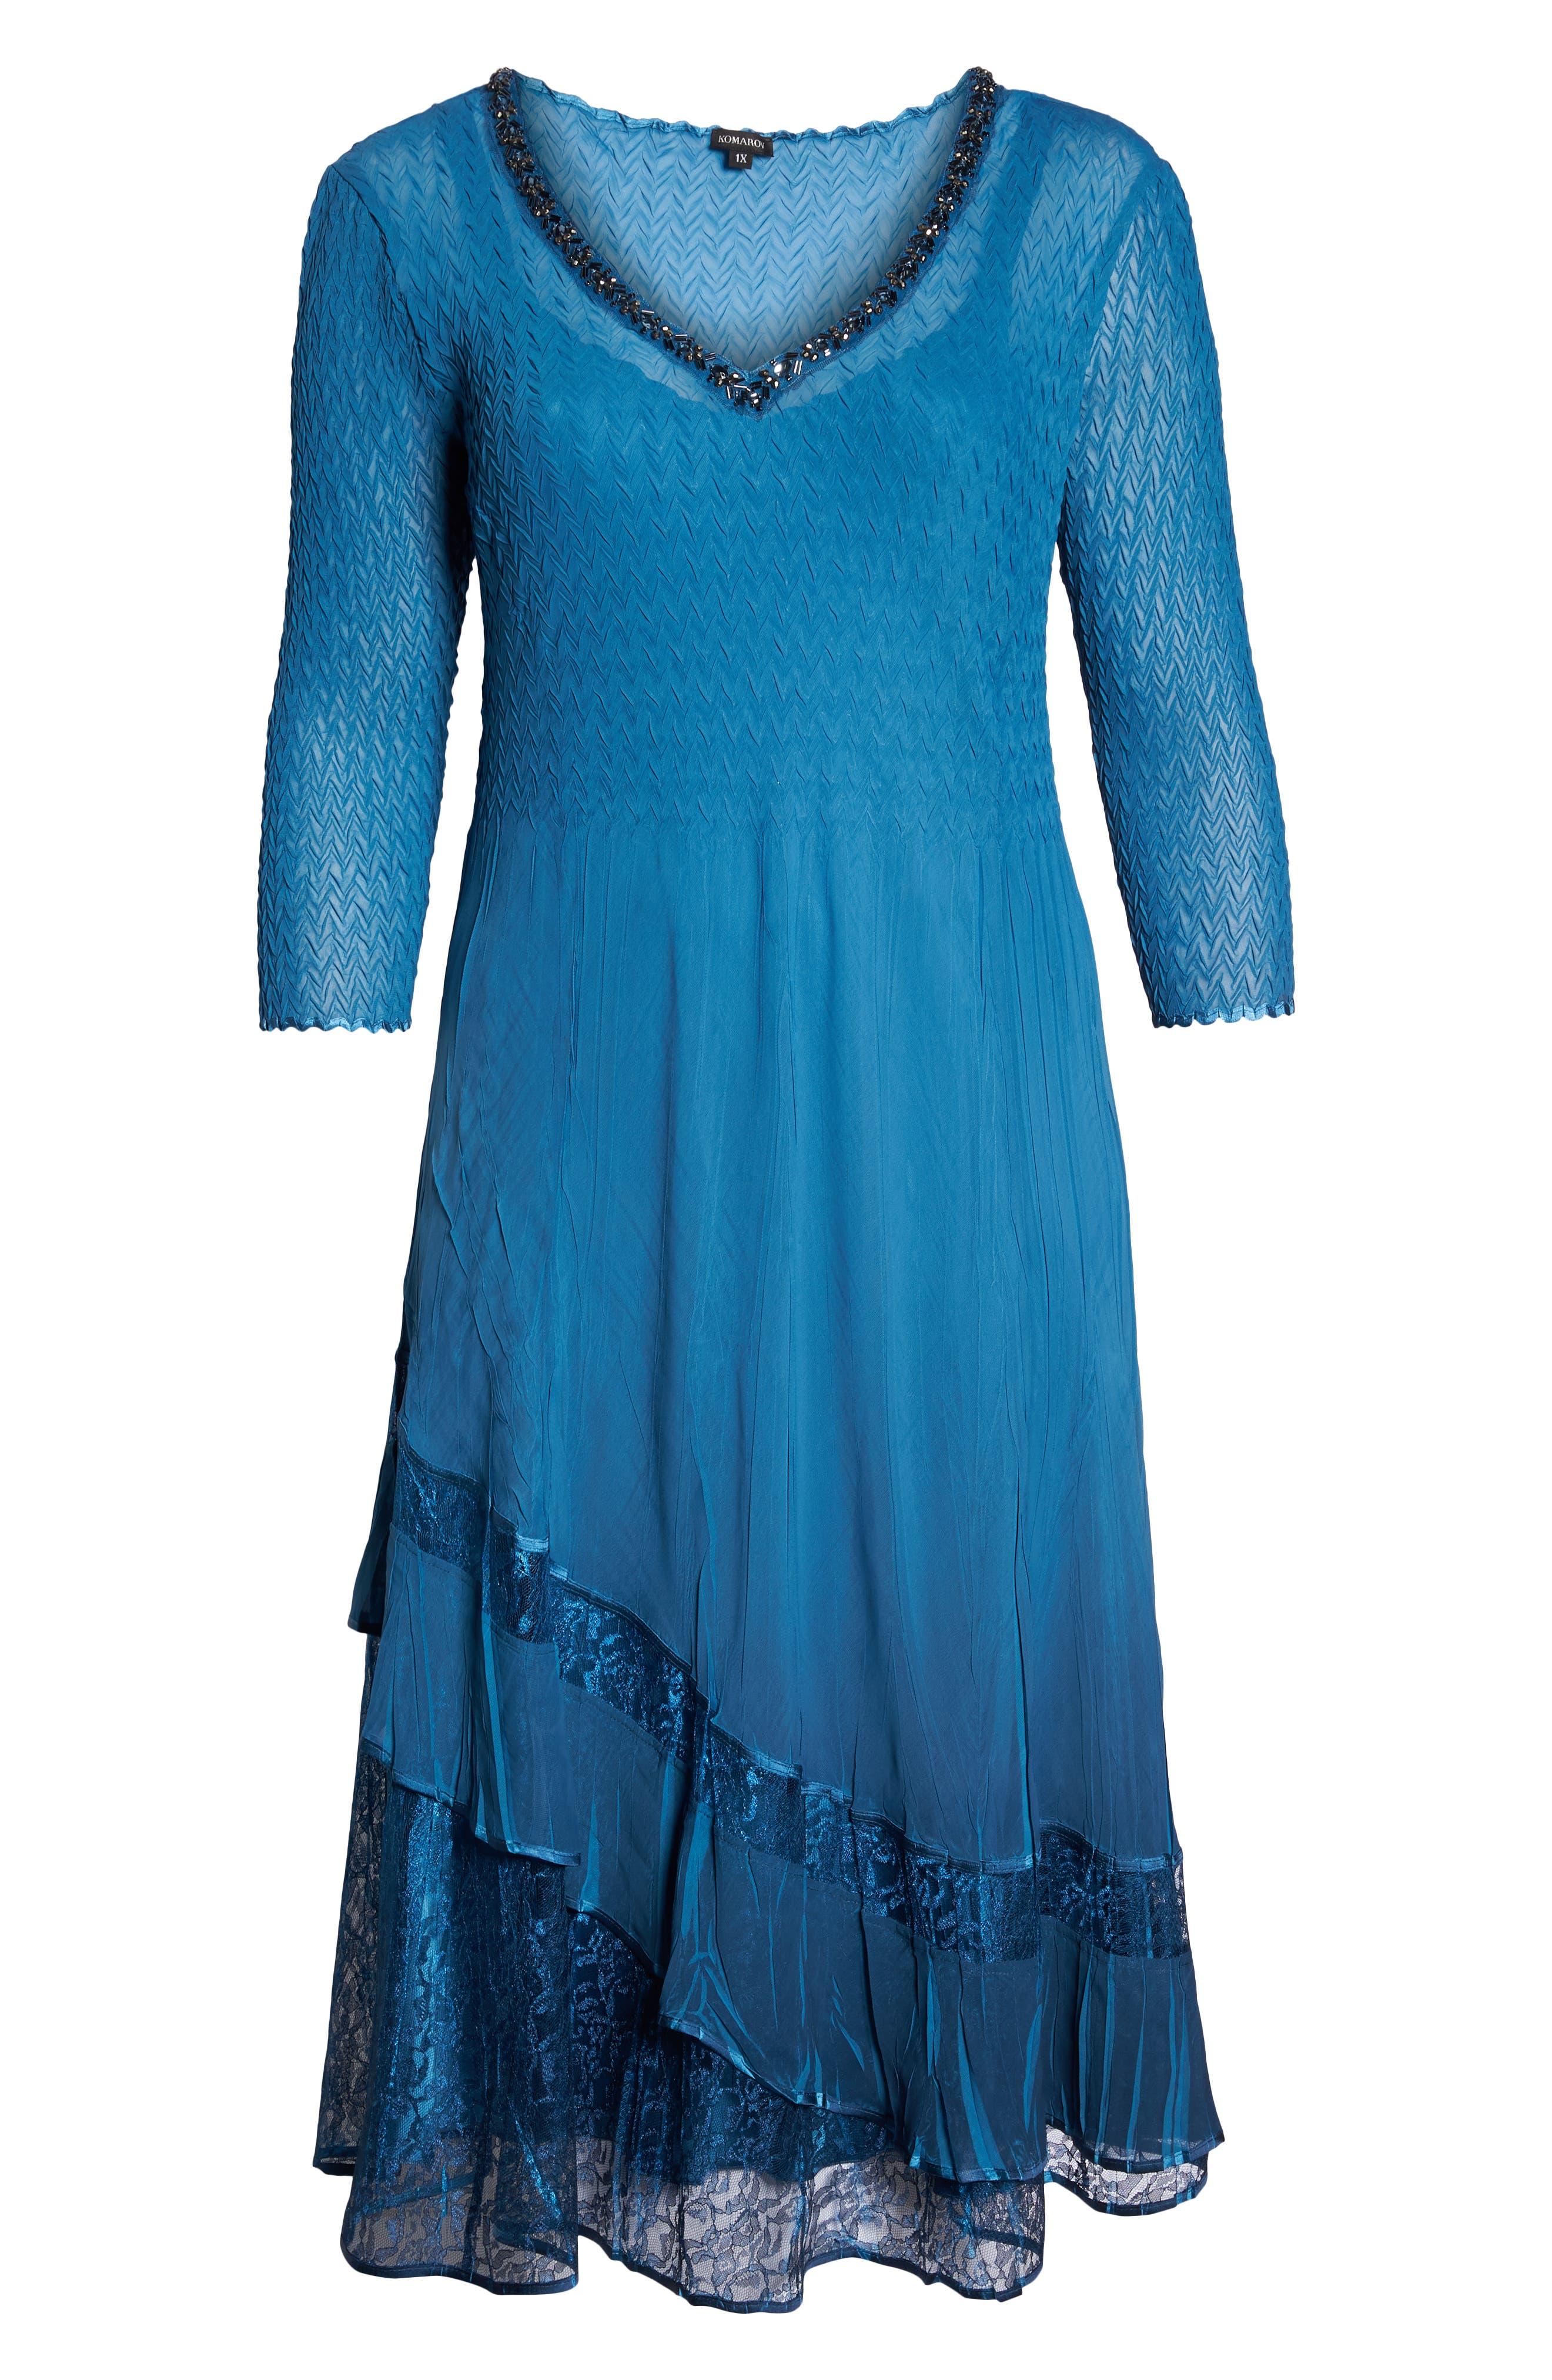 Beaded Neck Asymmetrical Charmeuse A-Line Dress,                             Alternate thumbnail 6, color,                             407